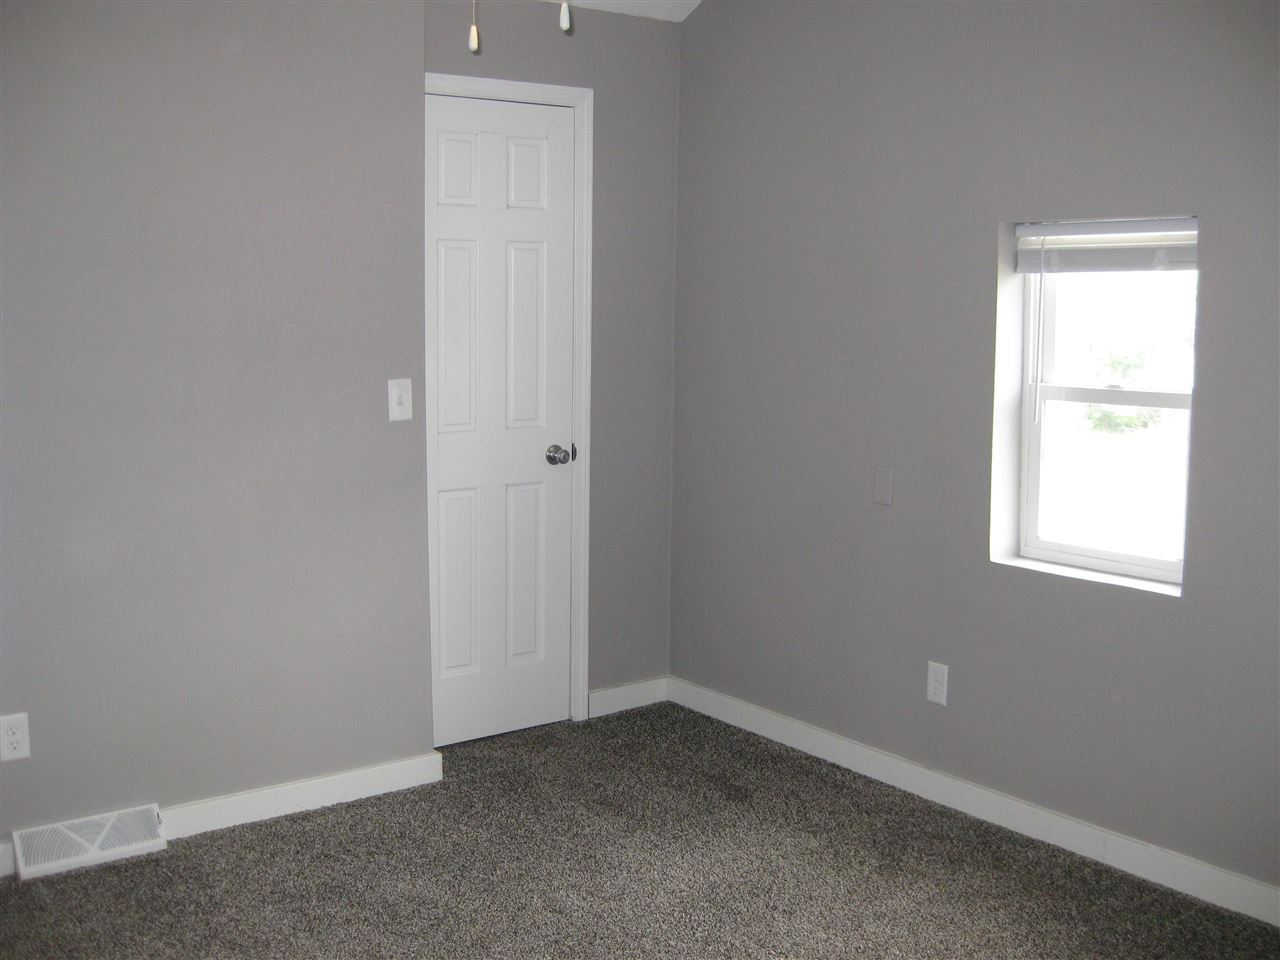 f_1913247_01 Real Estate in 53534 zip code